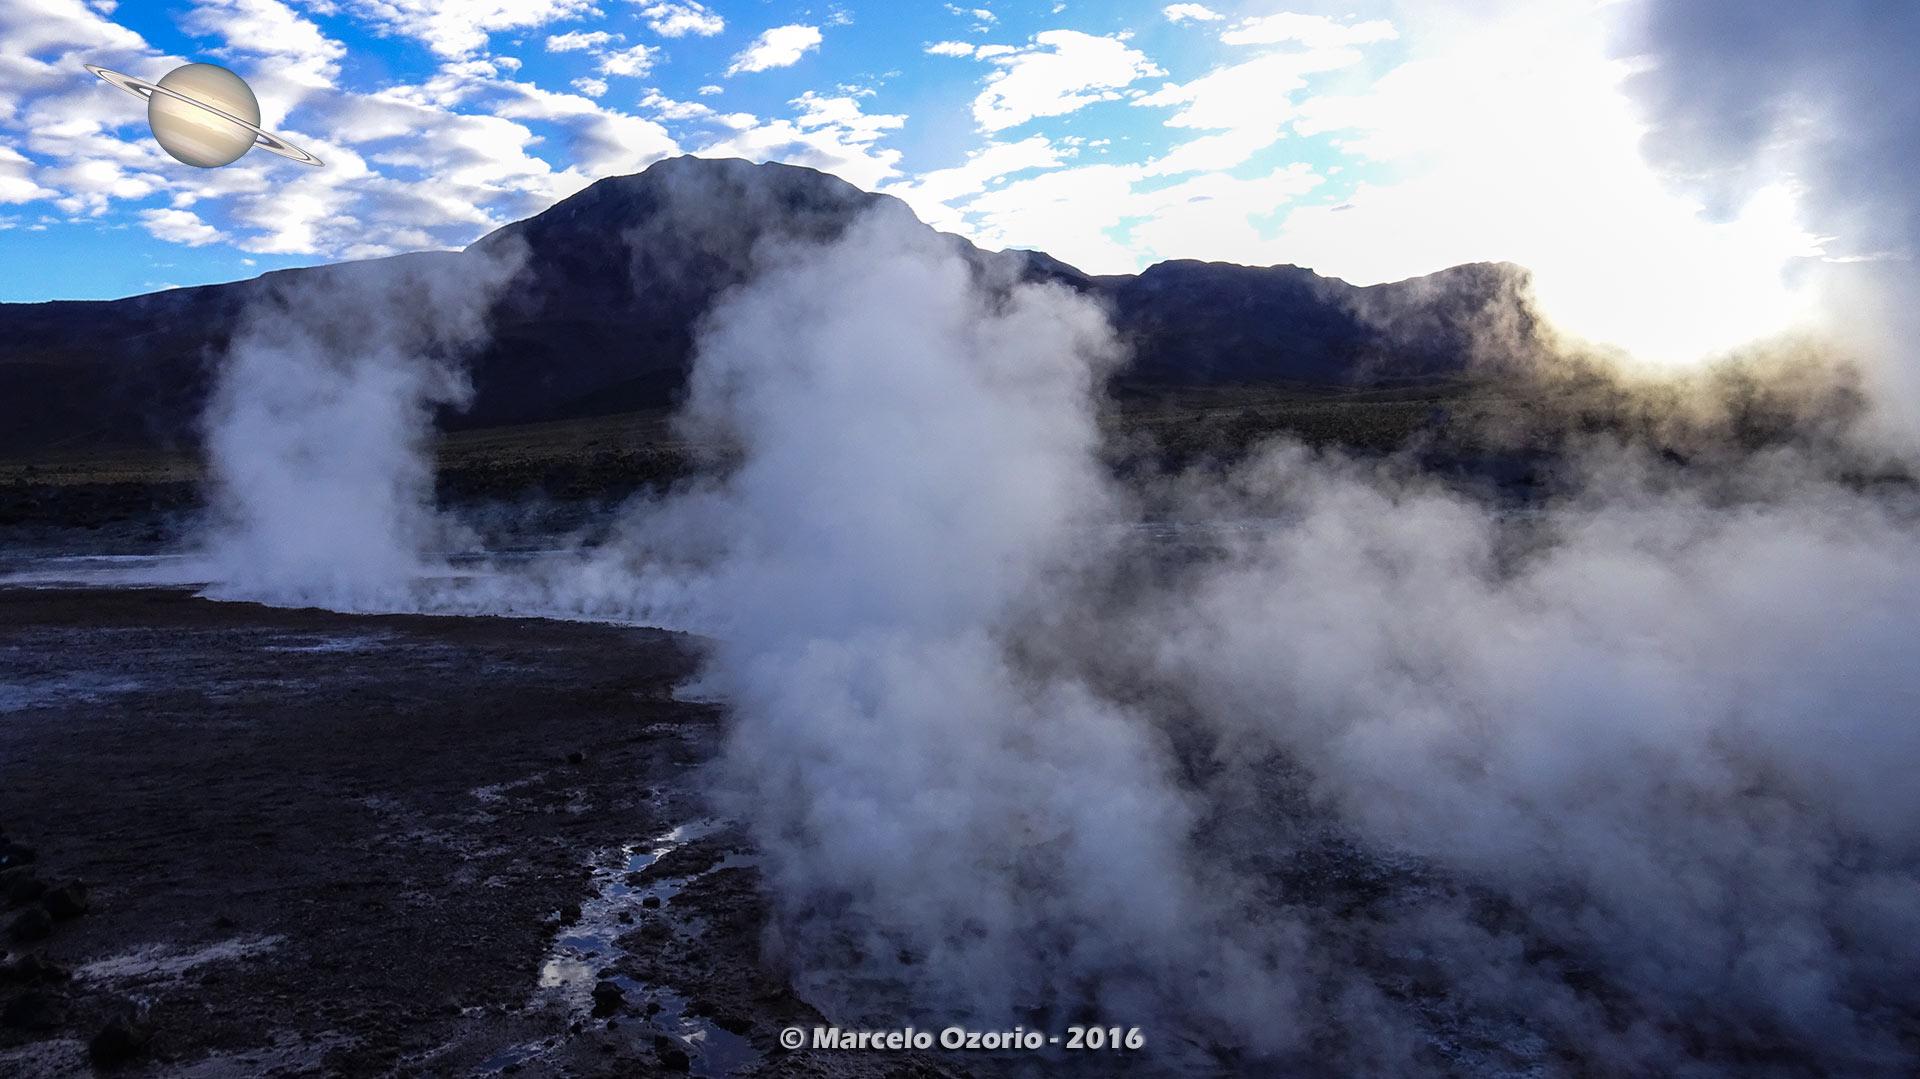 el tatio geysers atacama desert 8 - Os Surreais Gêiseres El Tatio - Deserto do Atacama - Chile